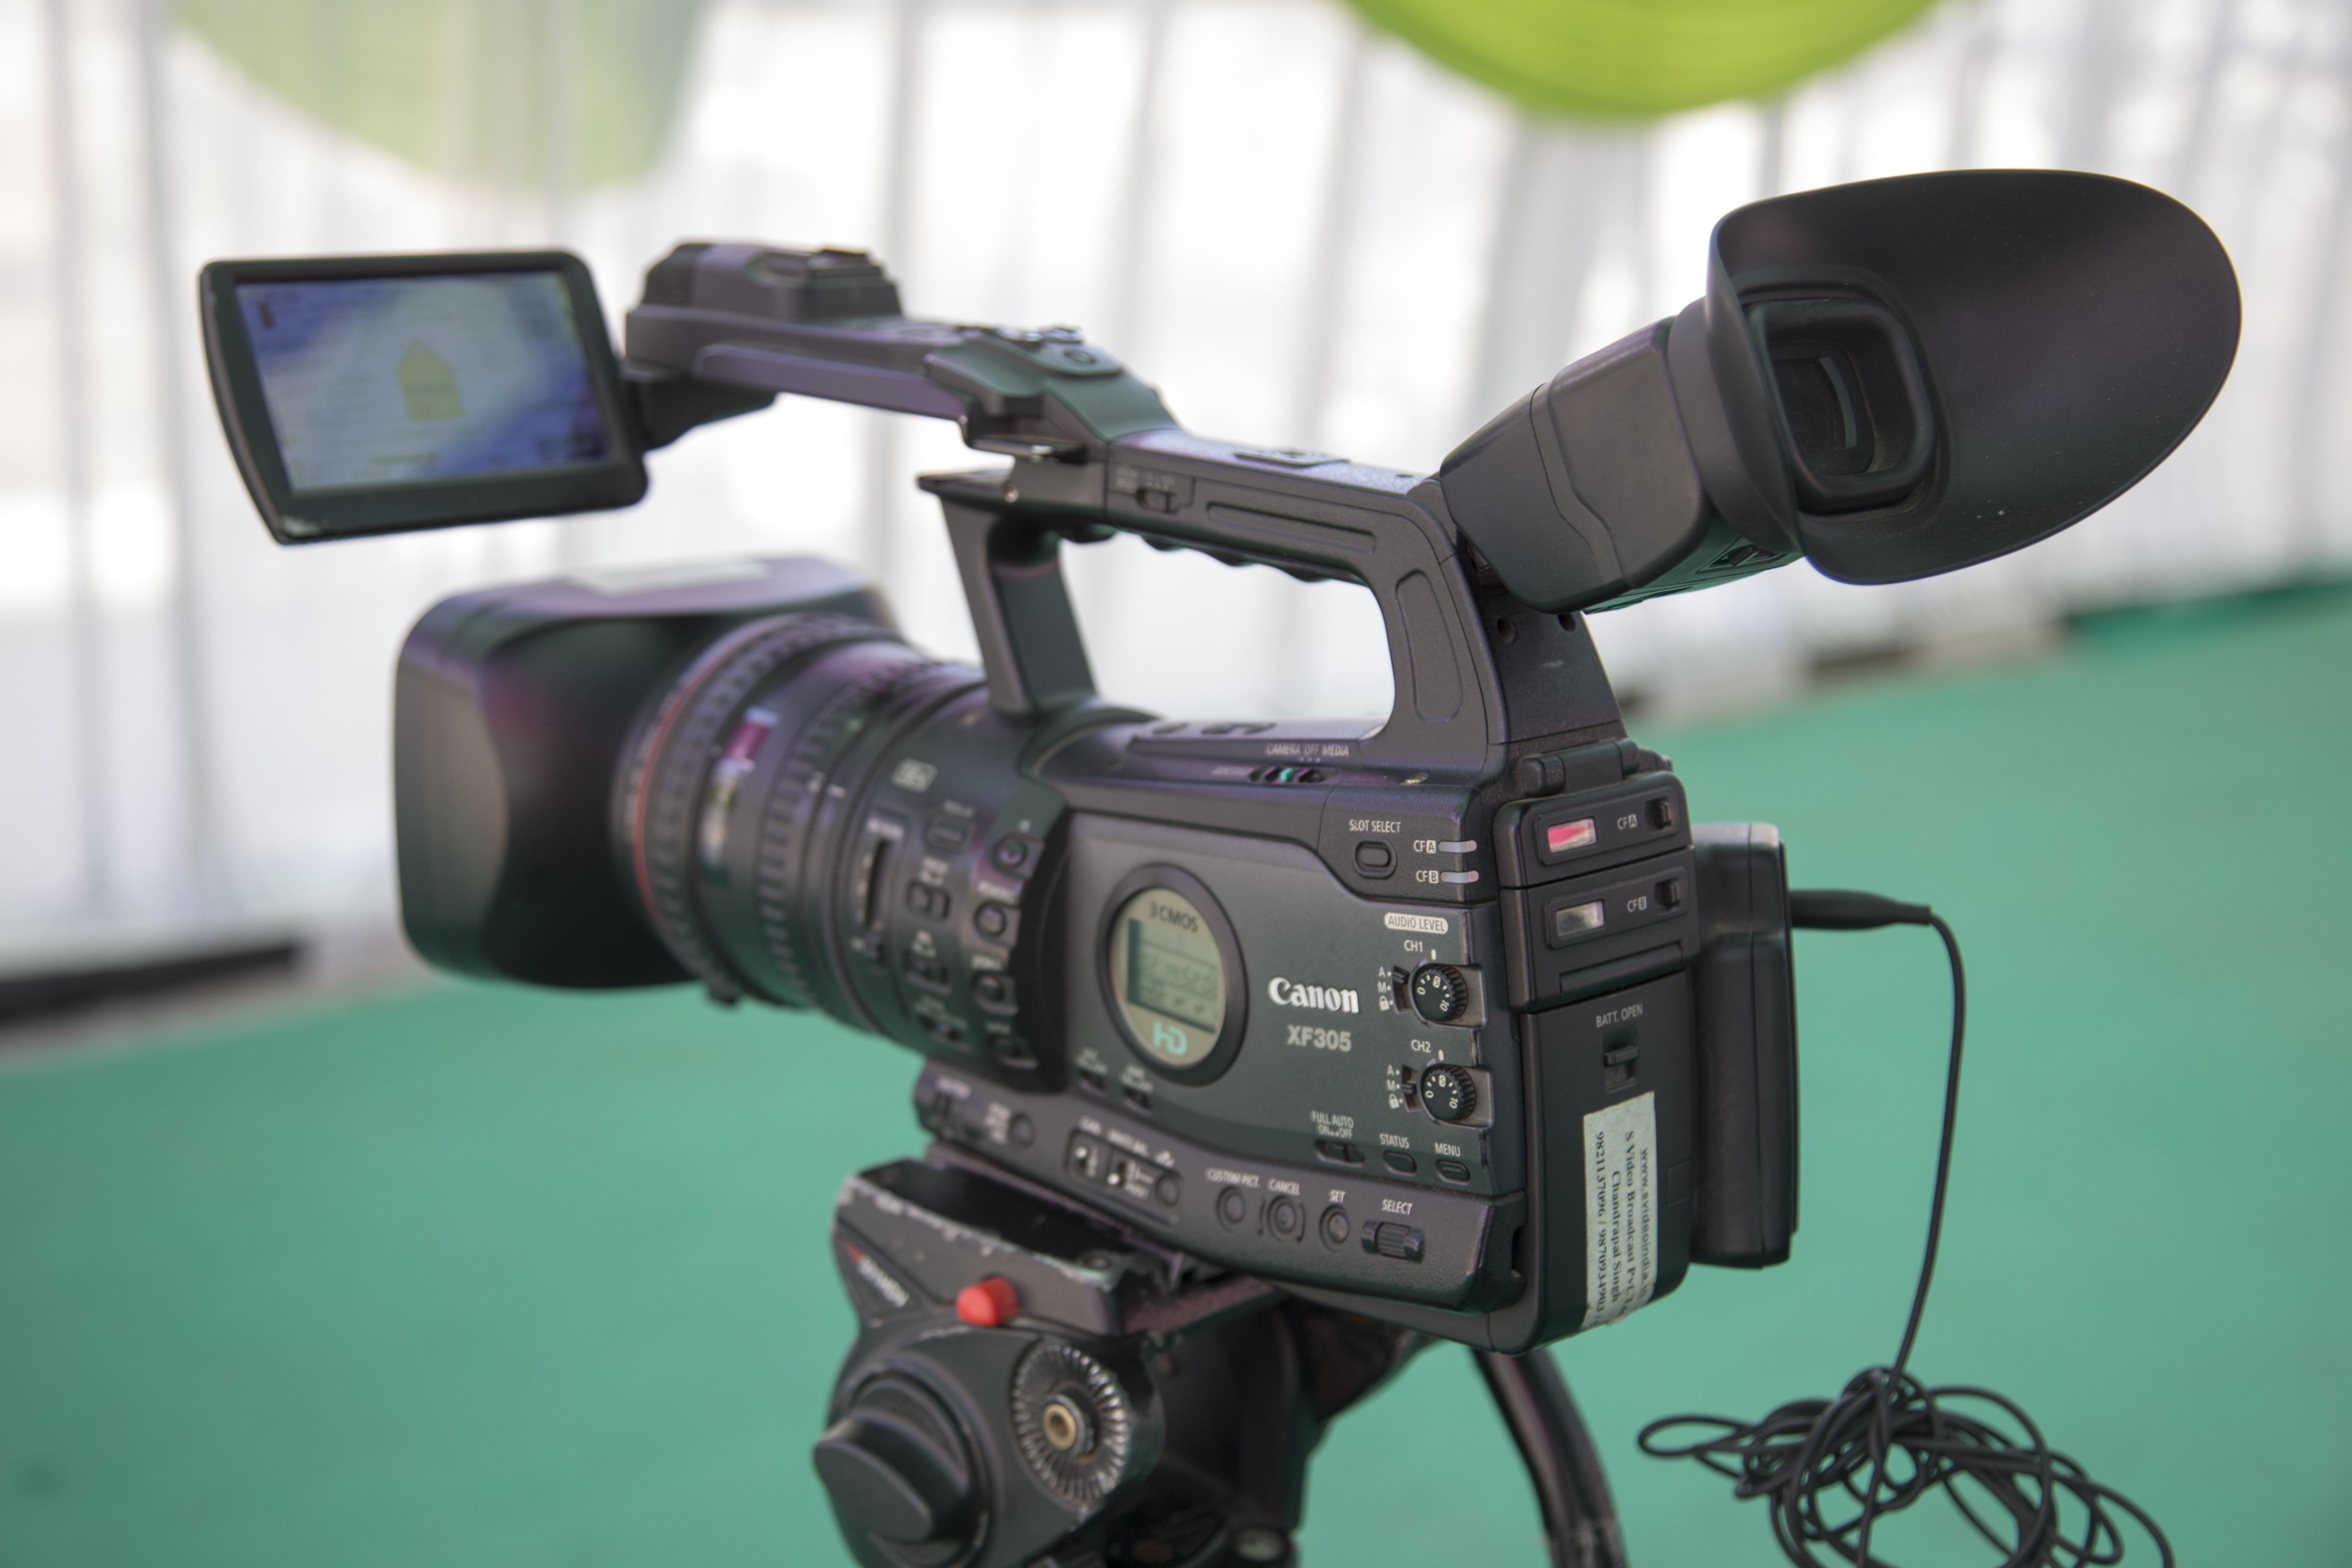 free images record equipment studio television broadcast